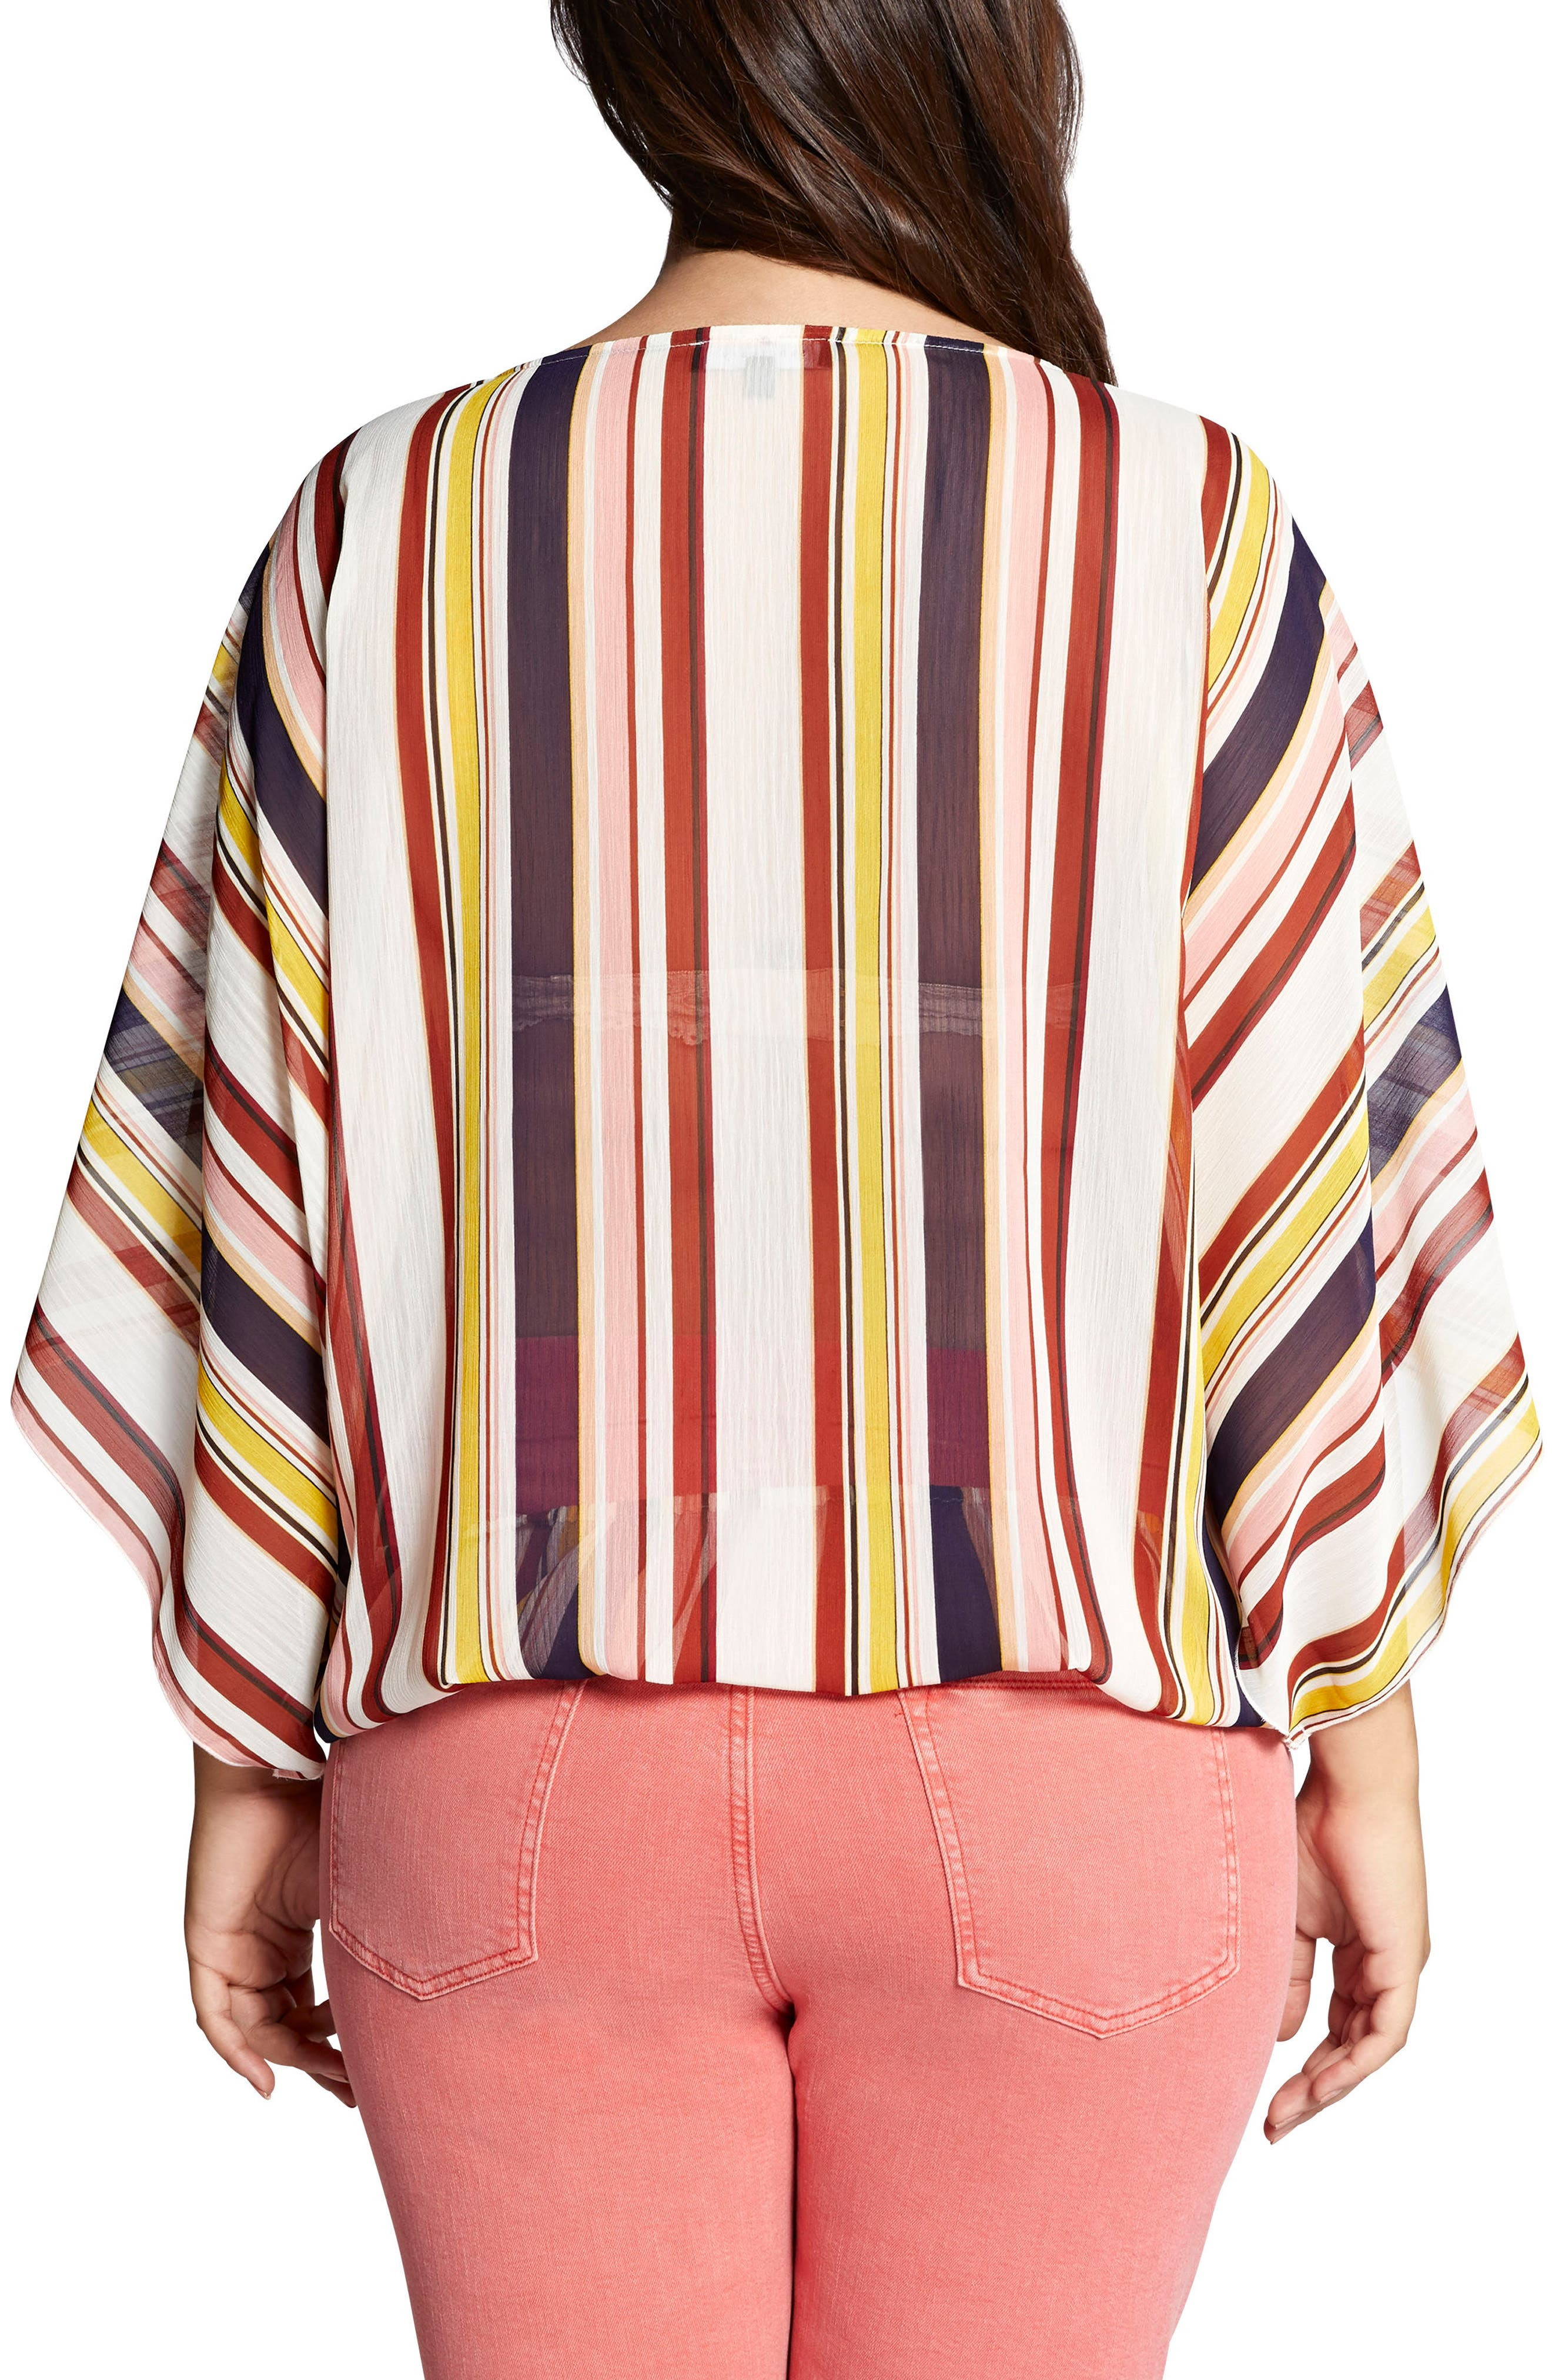 Poncho Top,                             Alternate thumbnail 2, color,                             Horizon Stripe